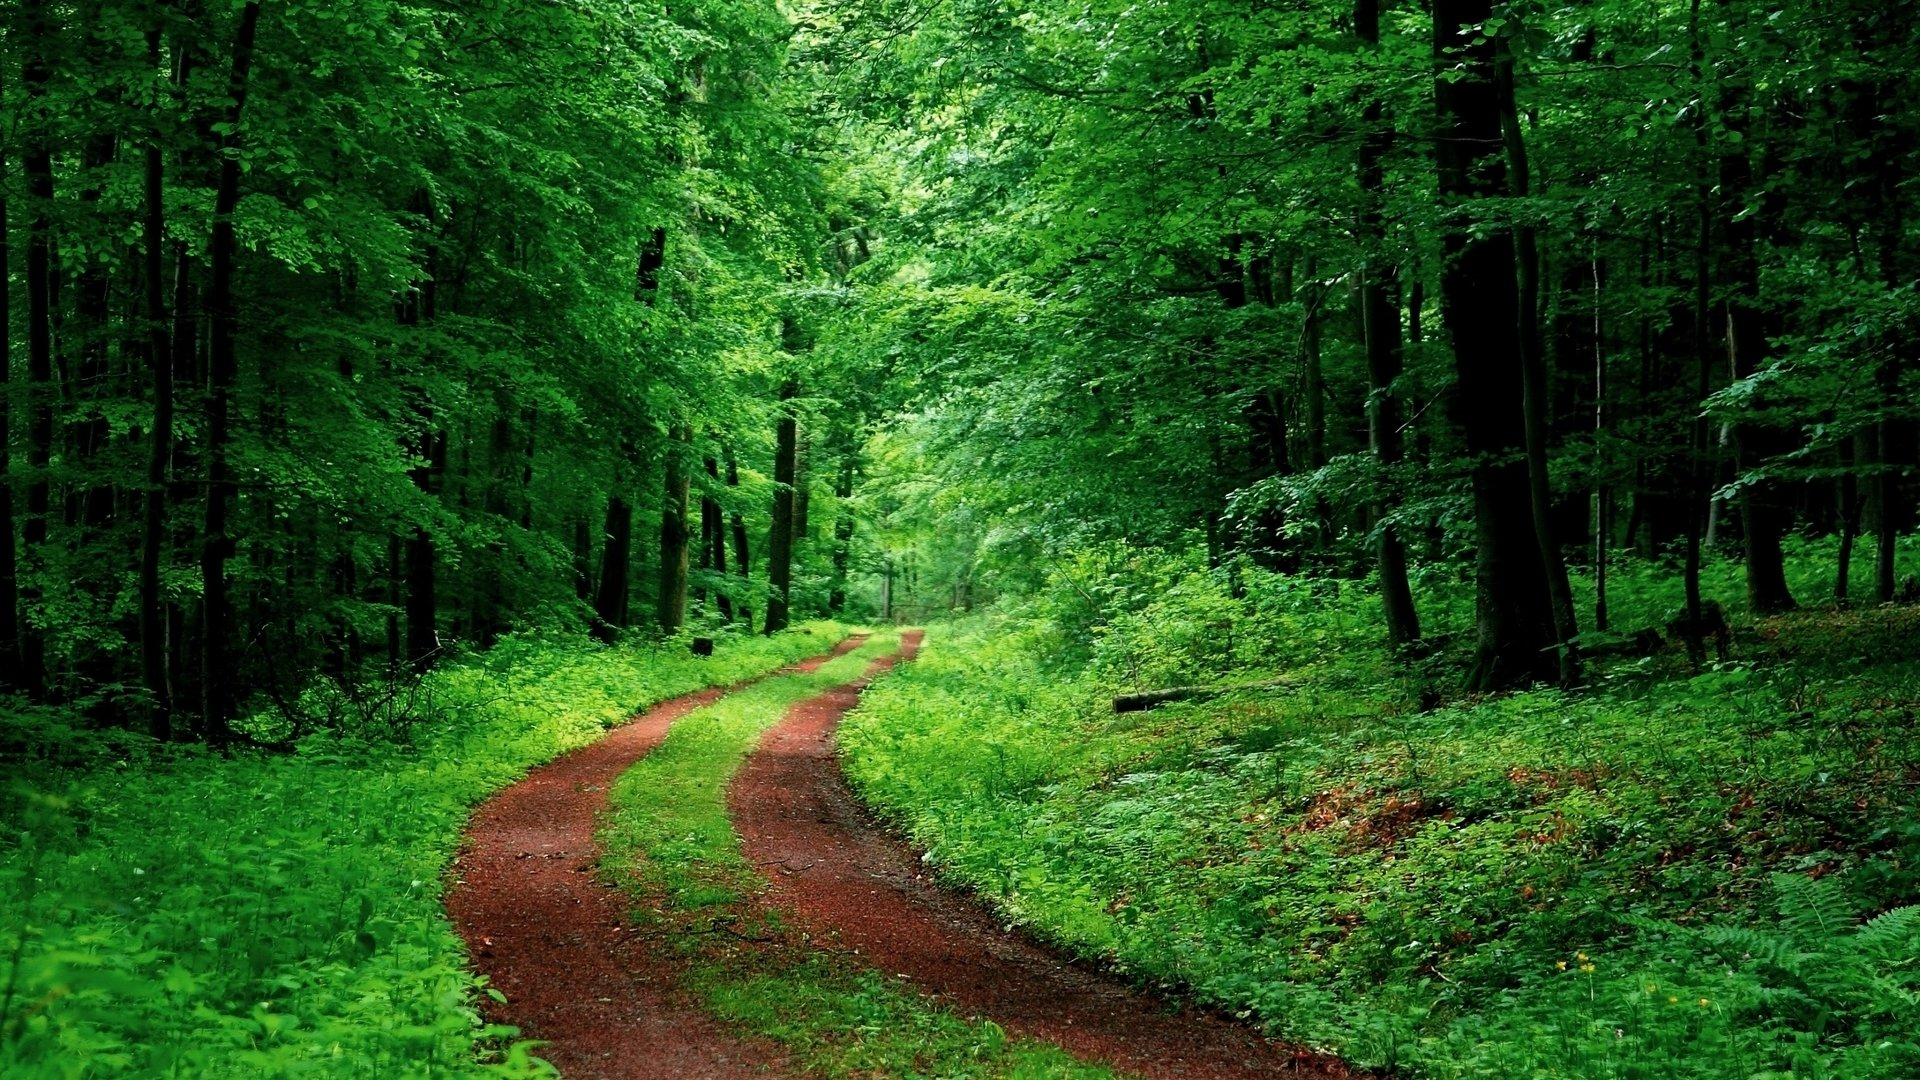 Man Made - Path  Green Vegetation Forest Nature Wallpaper